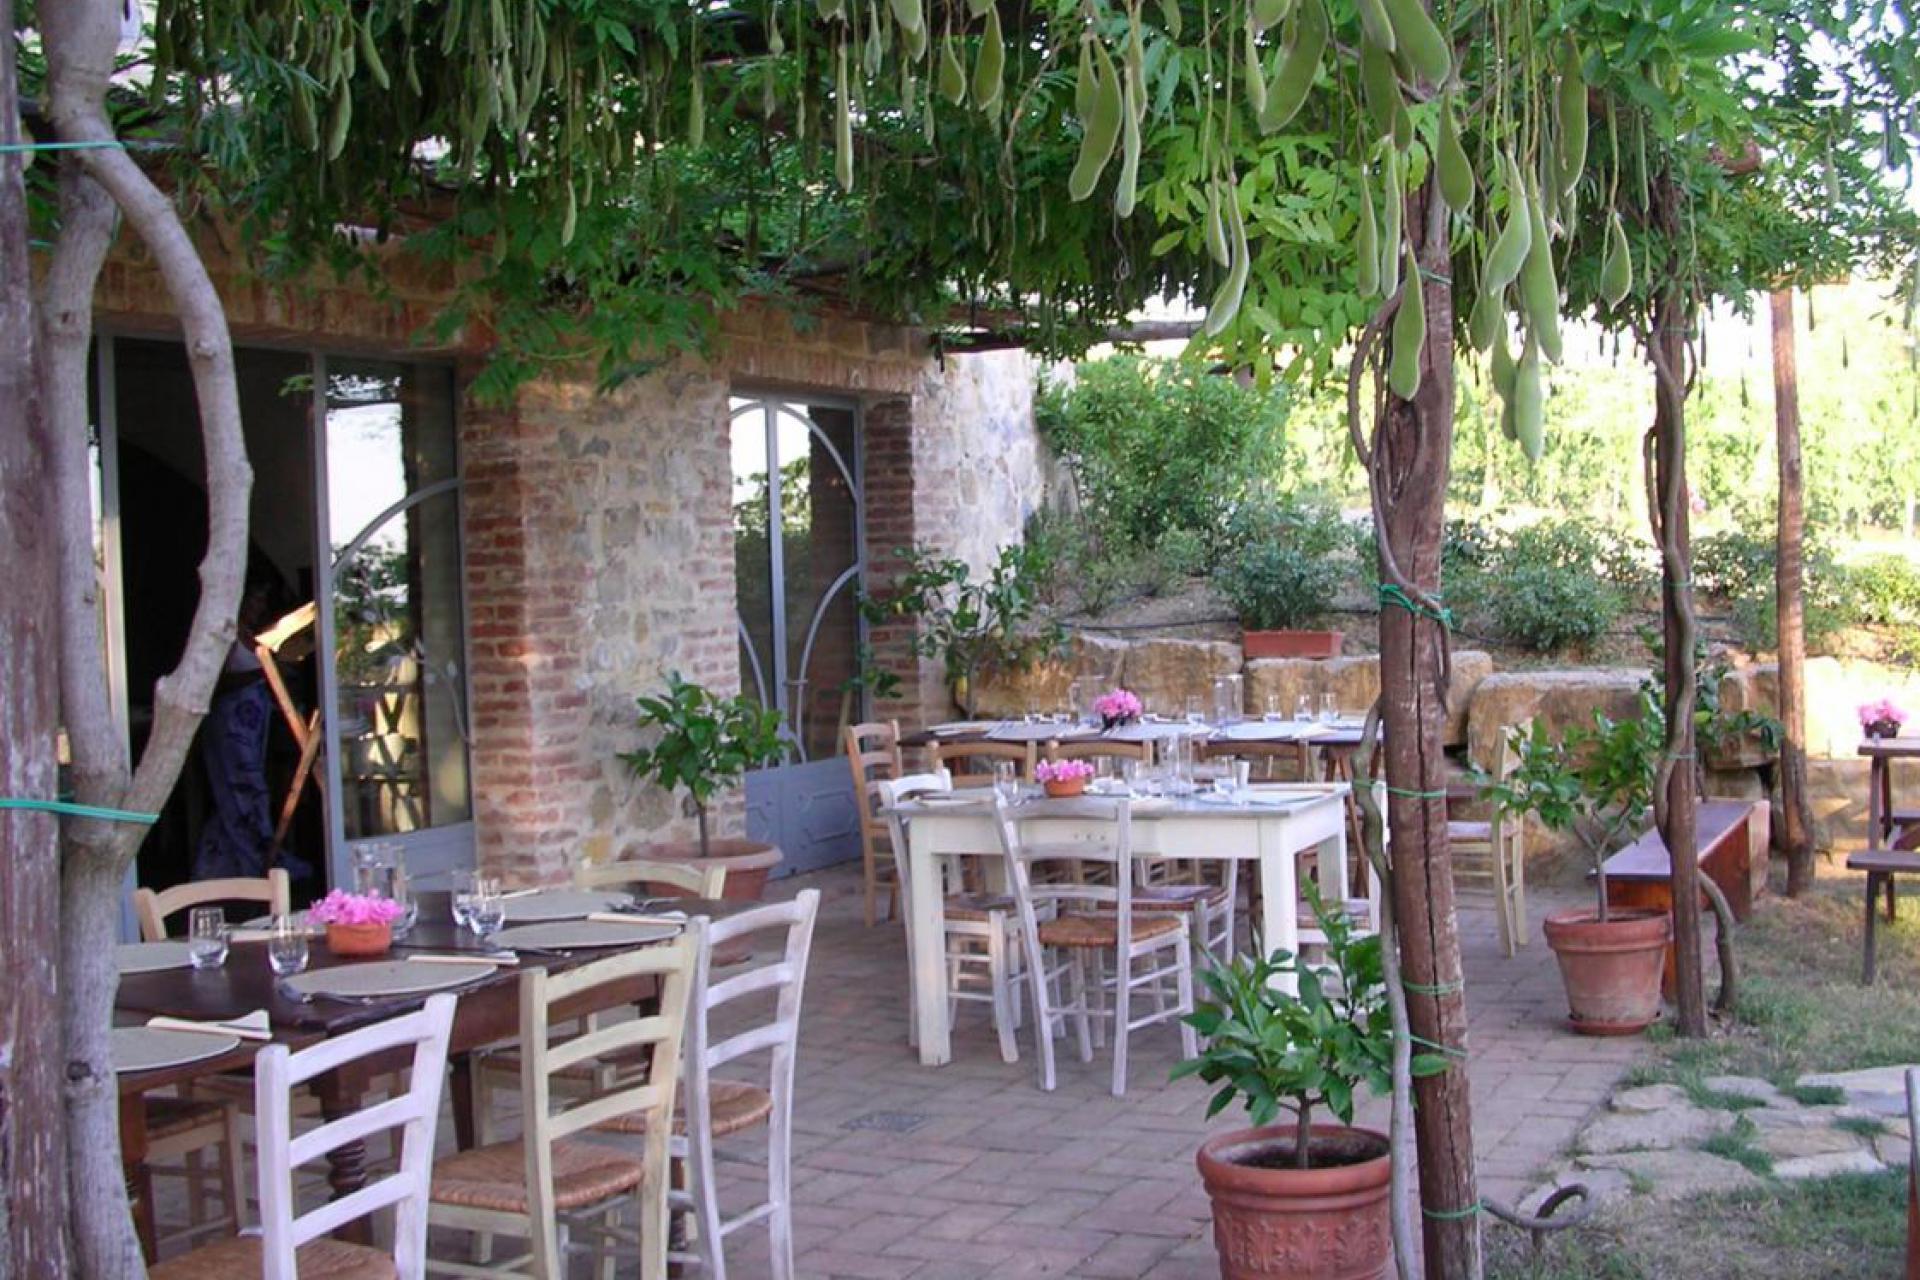 Agriturismo Toscane Agriturismo Chianti-gebied – in authentieke wijnboerderij | myitaly.nl